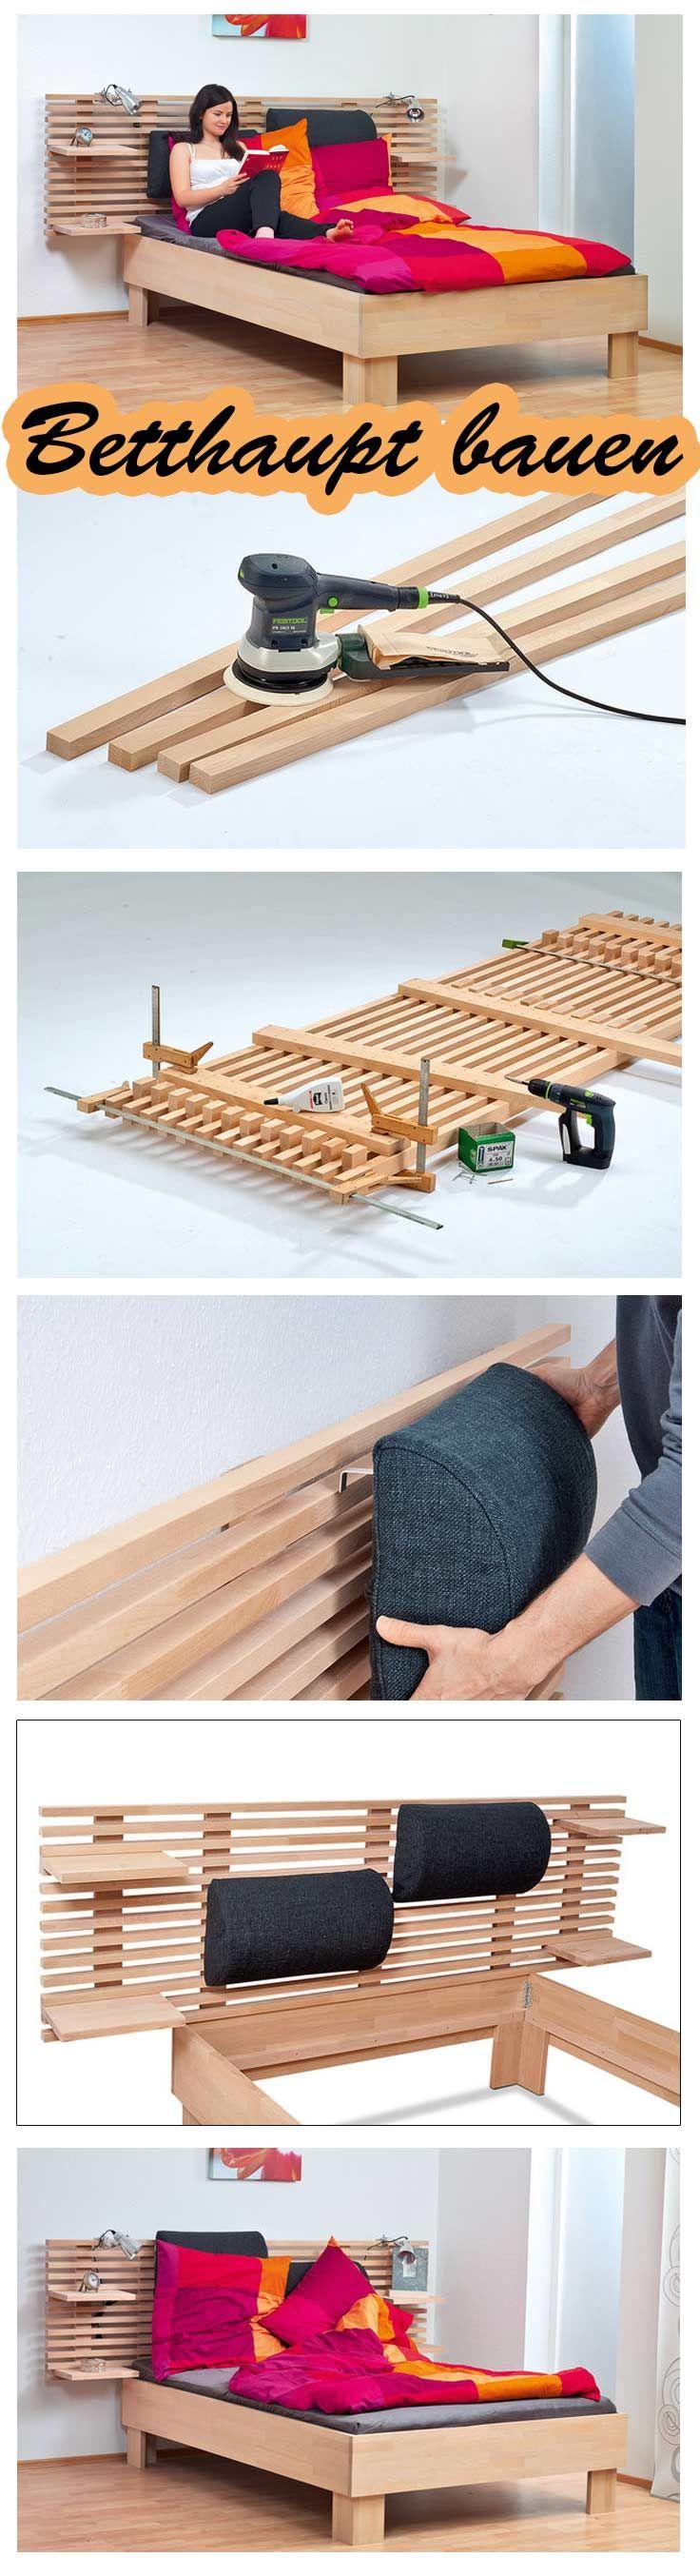 betthaupt bauen palls ngar inredning och m bler. Black Bedroom Furniture Sets. Home Design Ideas